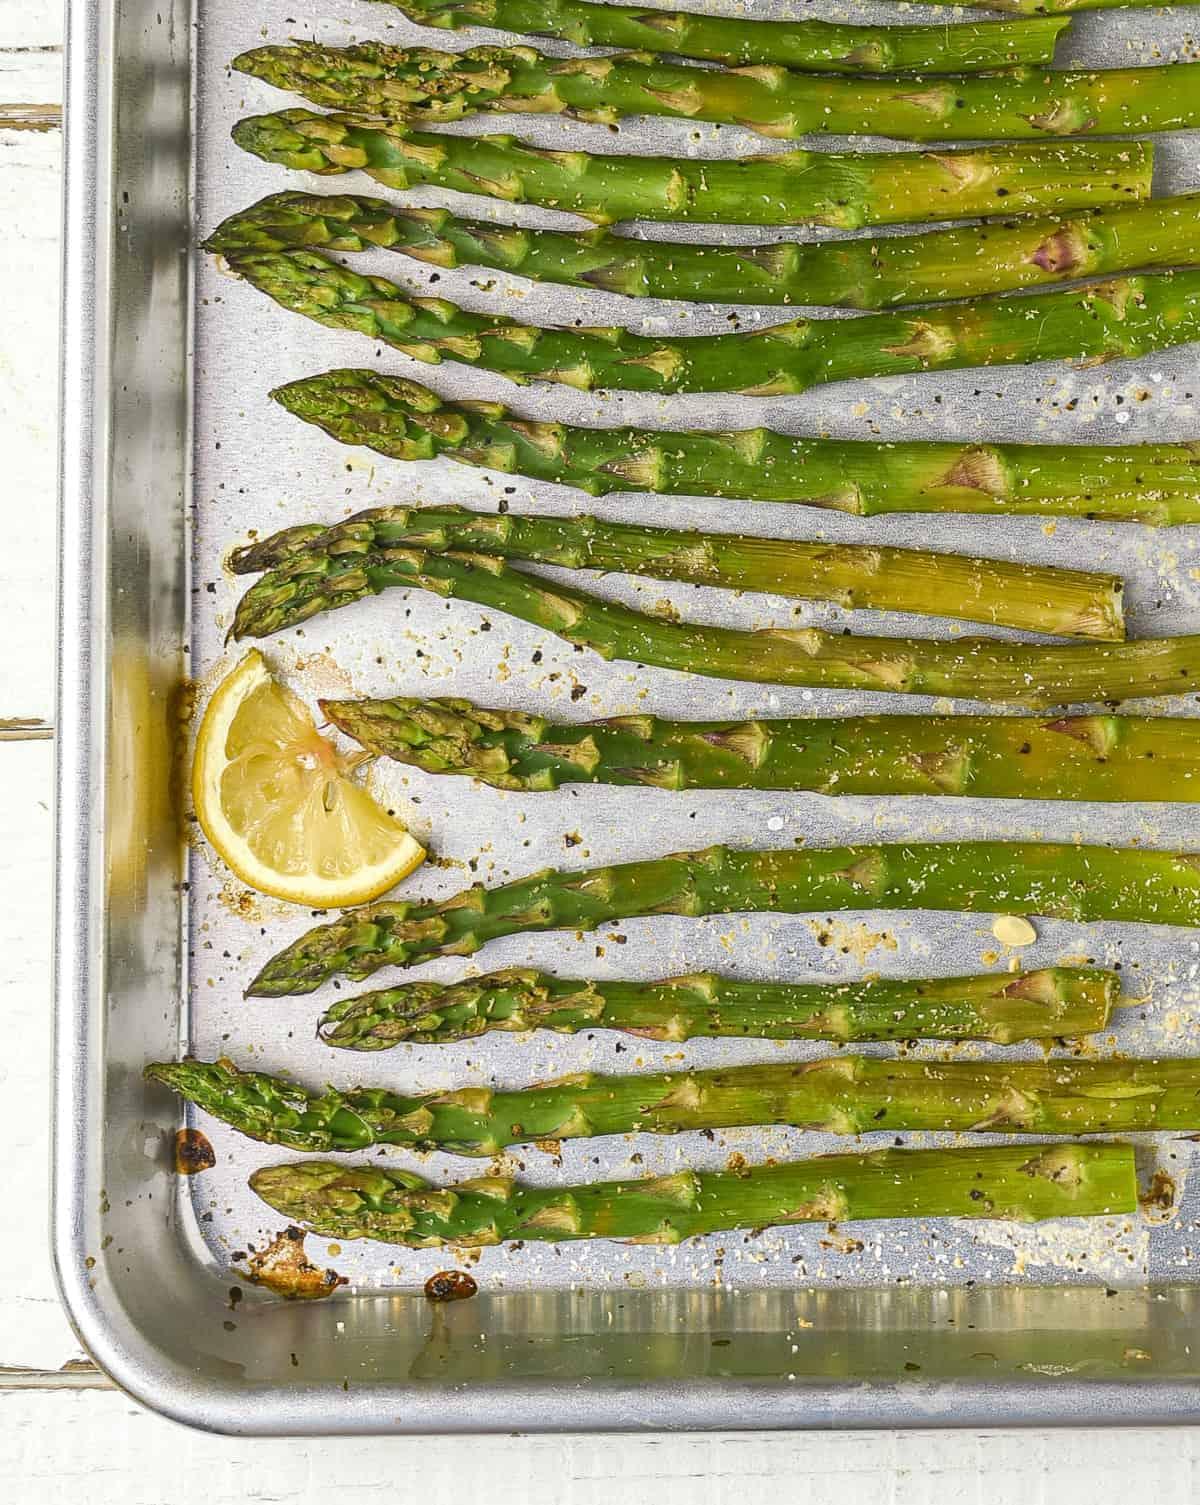 Easy roasted asparagus on baking sheet with lemon.